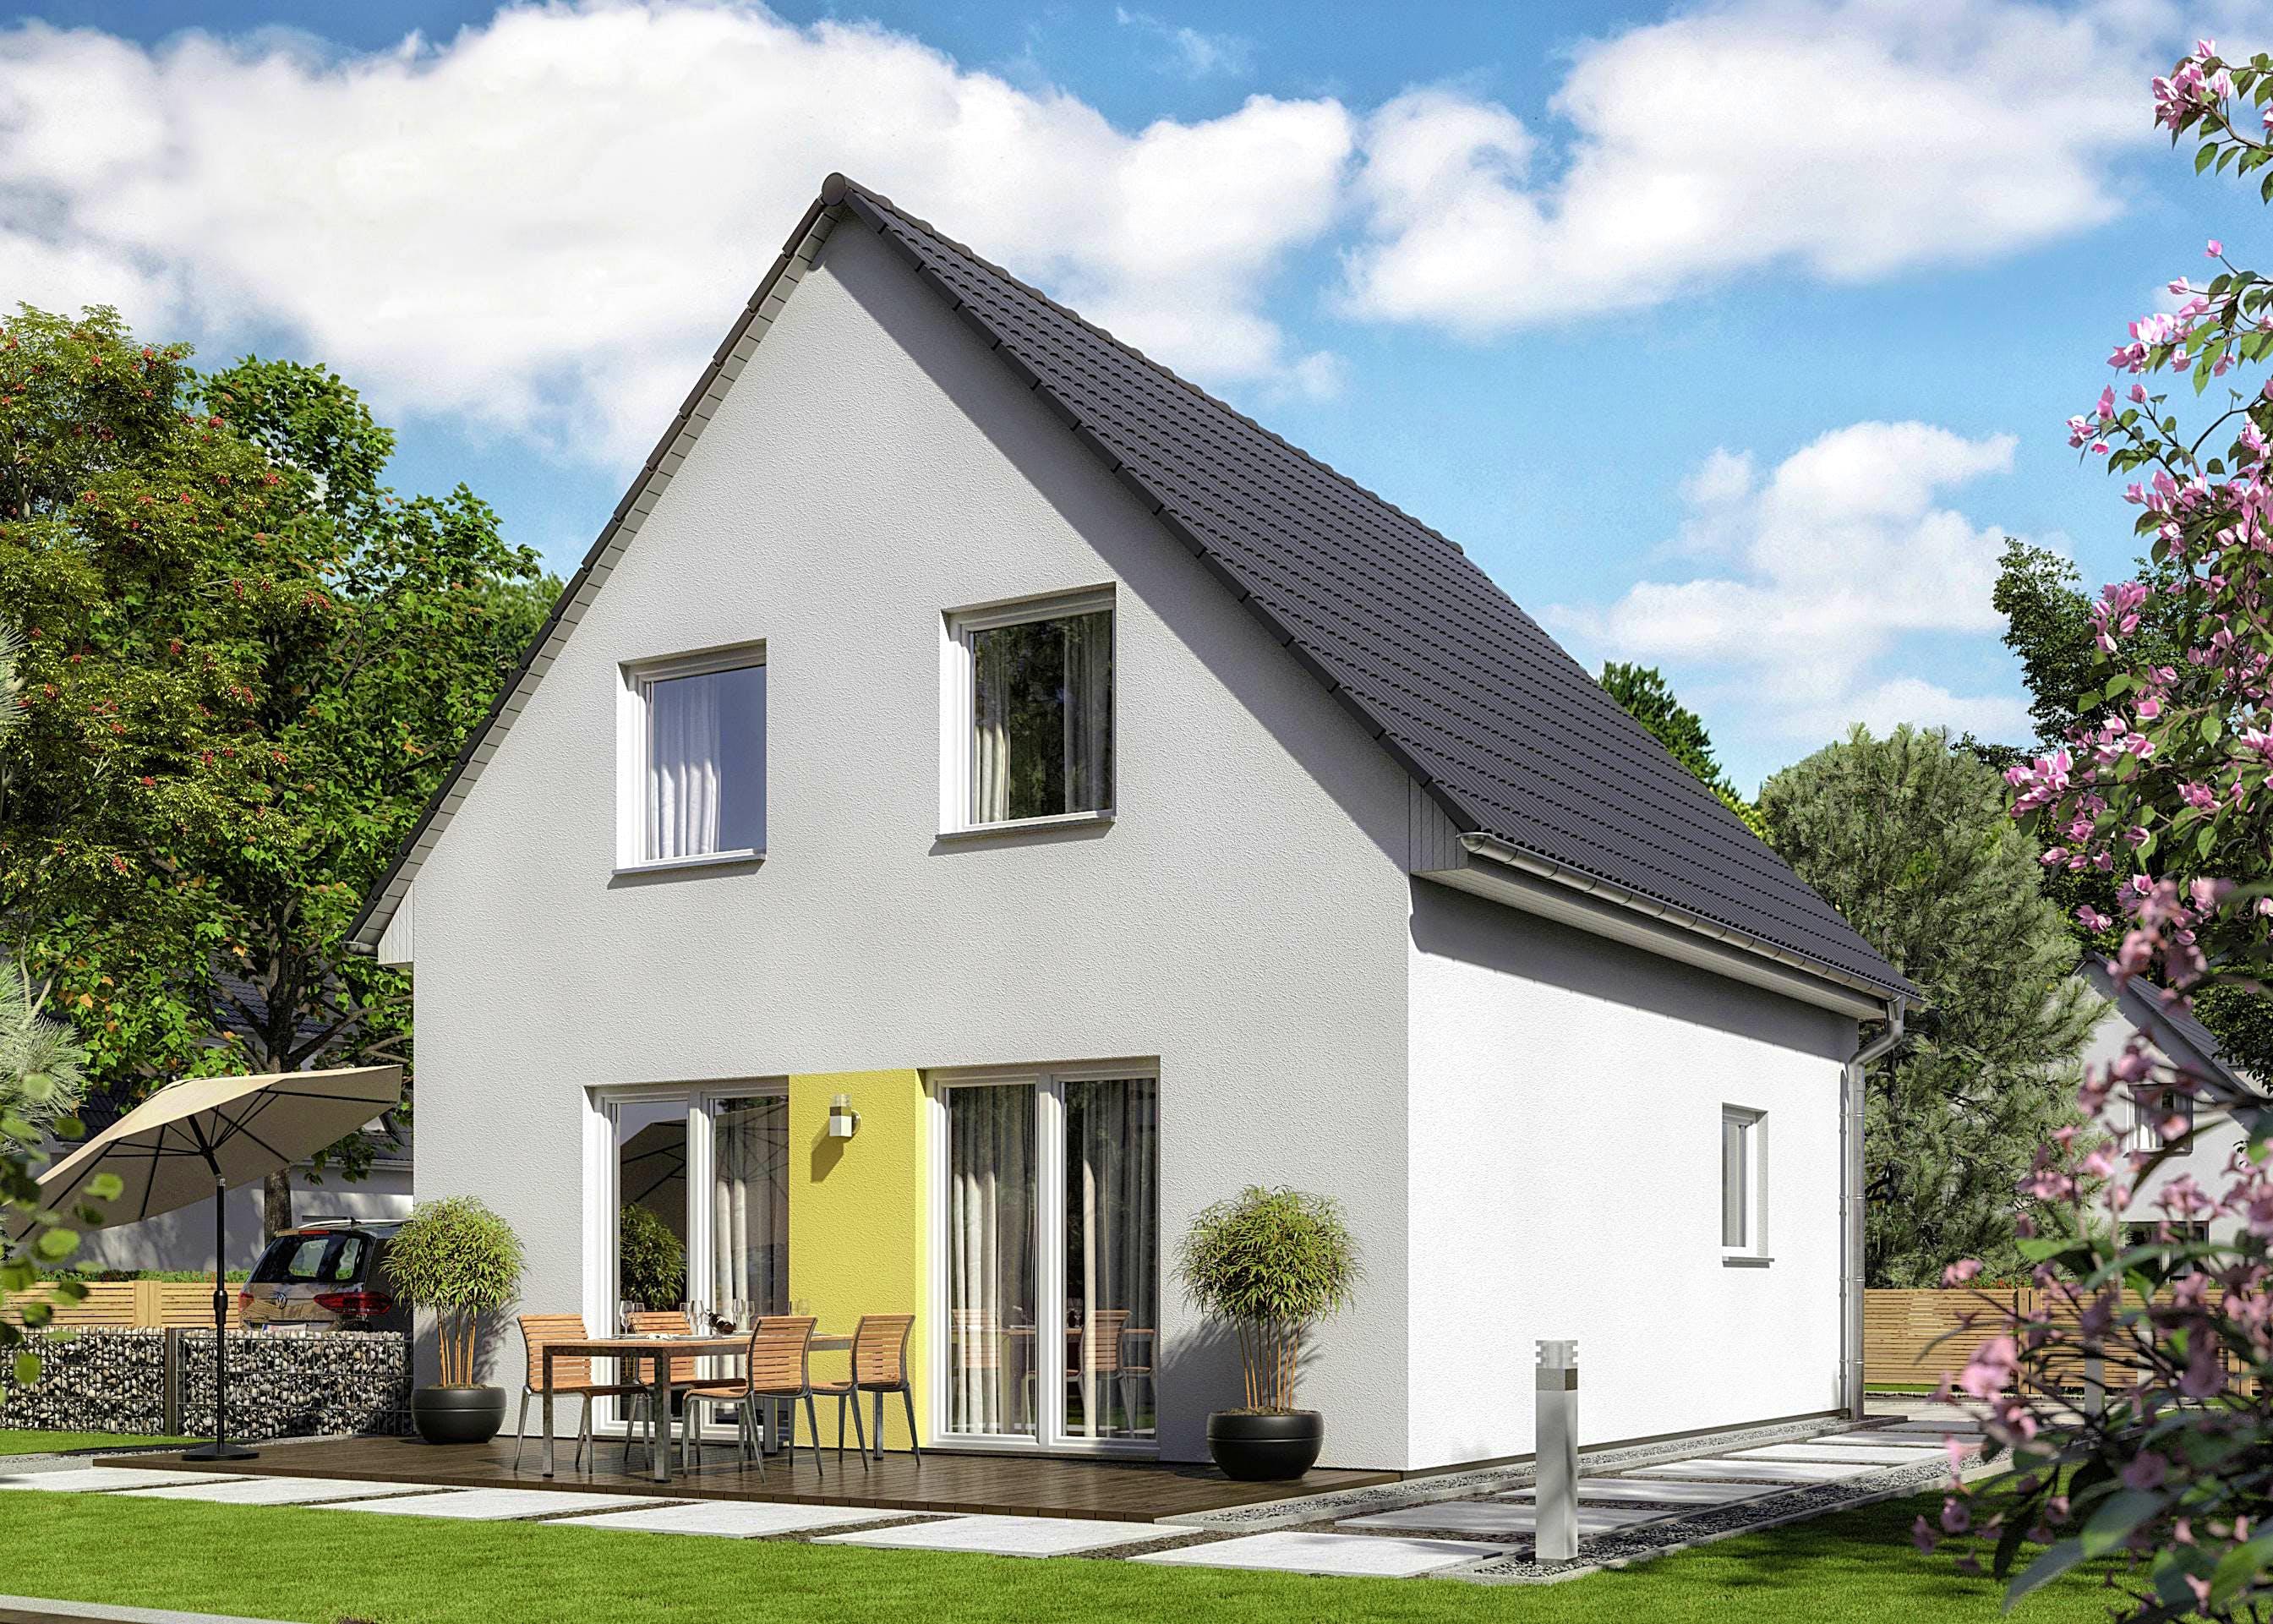 stunning ferienhaus bauen preise pictures. Black Bedroom Furniture Sets. Home Design Ideas